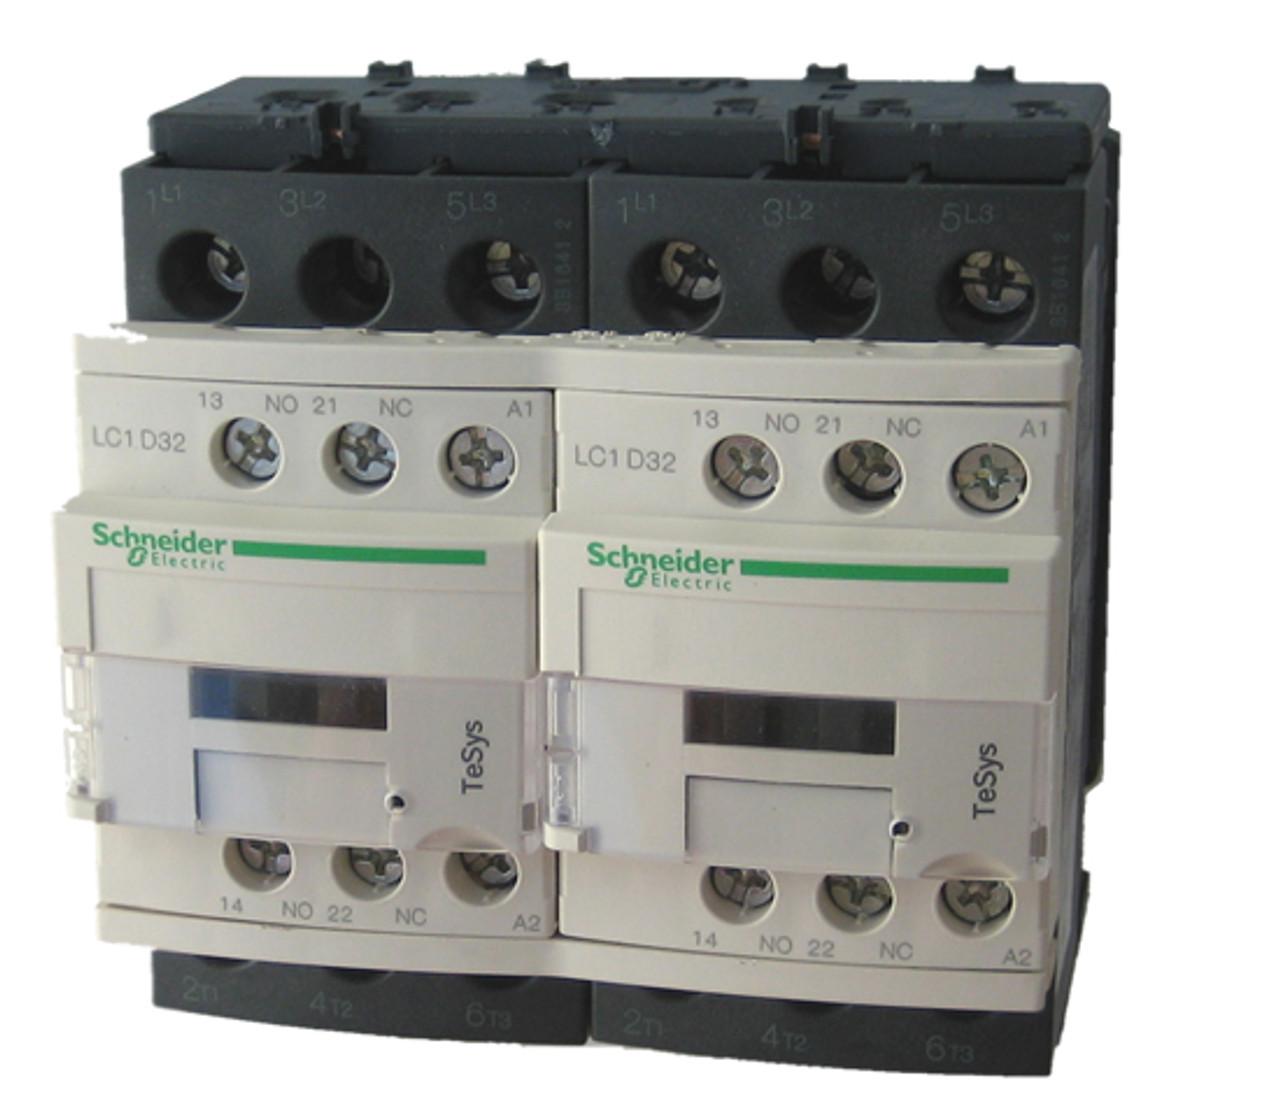 Schneider Electric LC2D32K7 reversing contactor